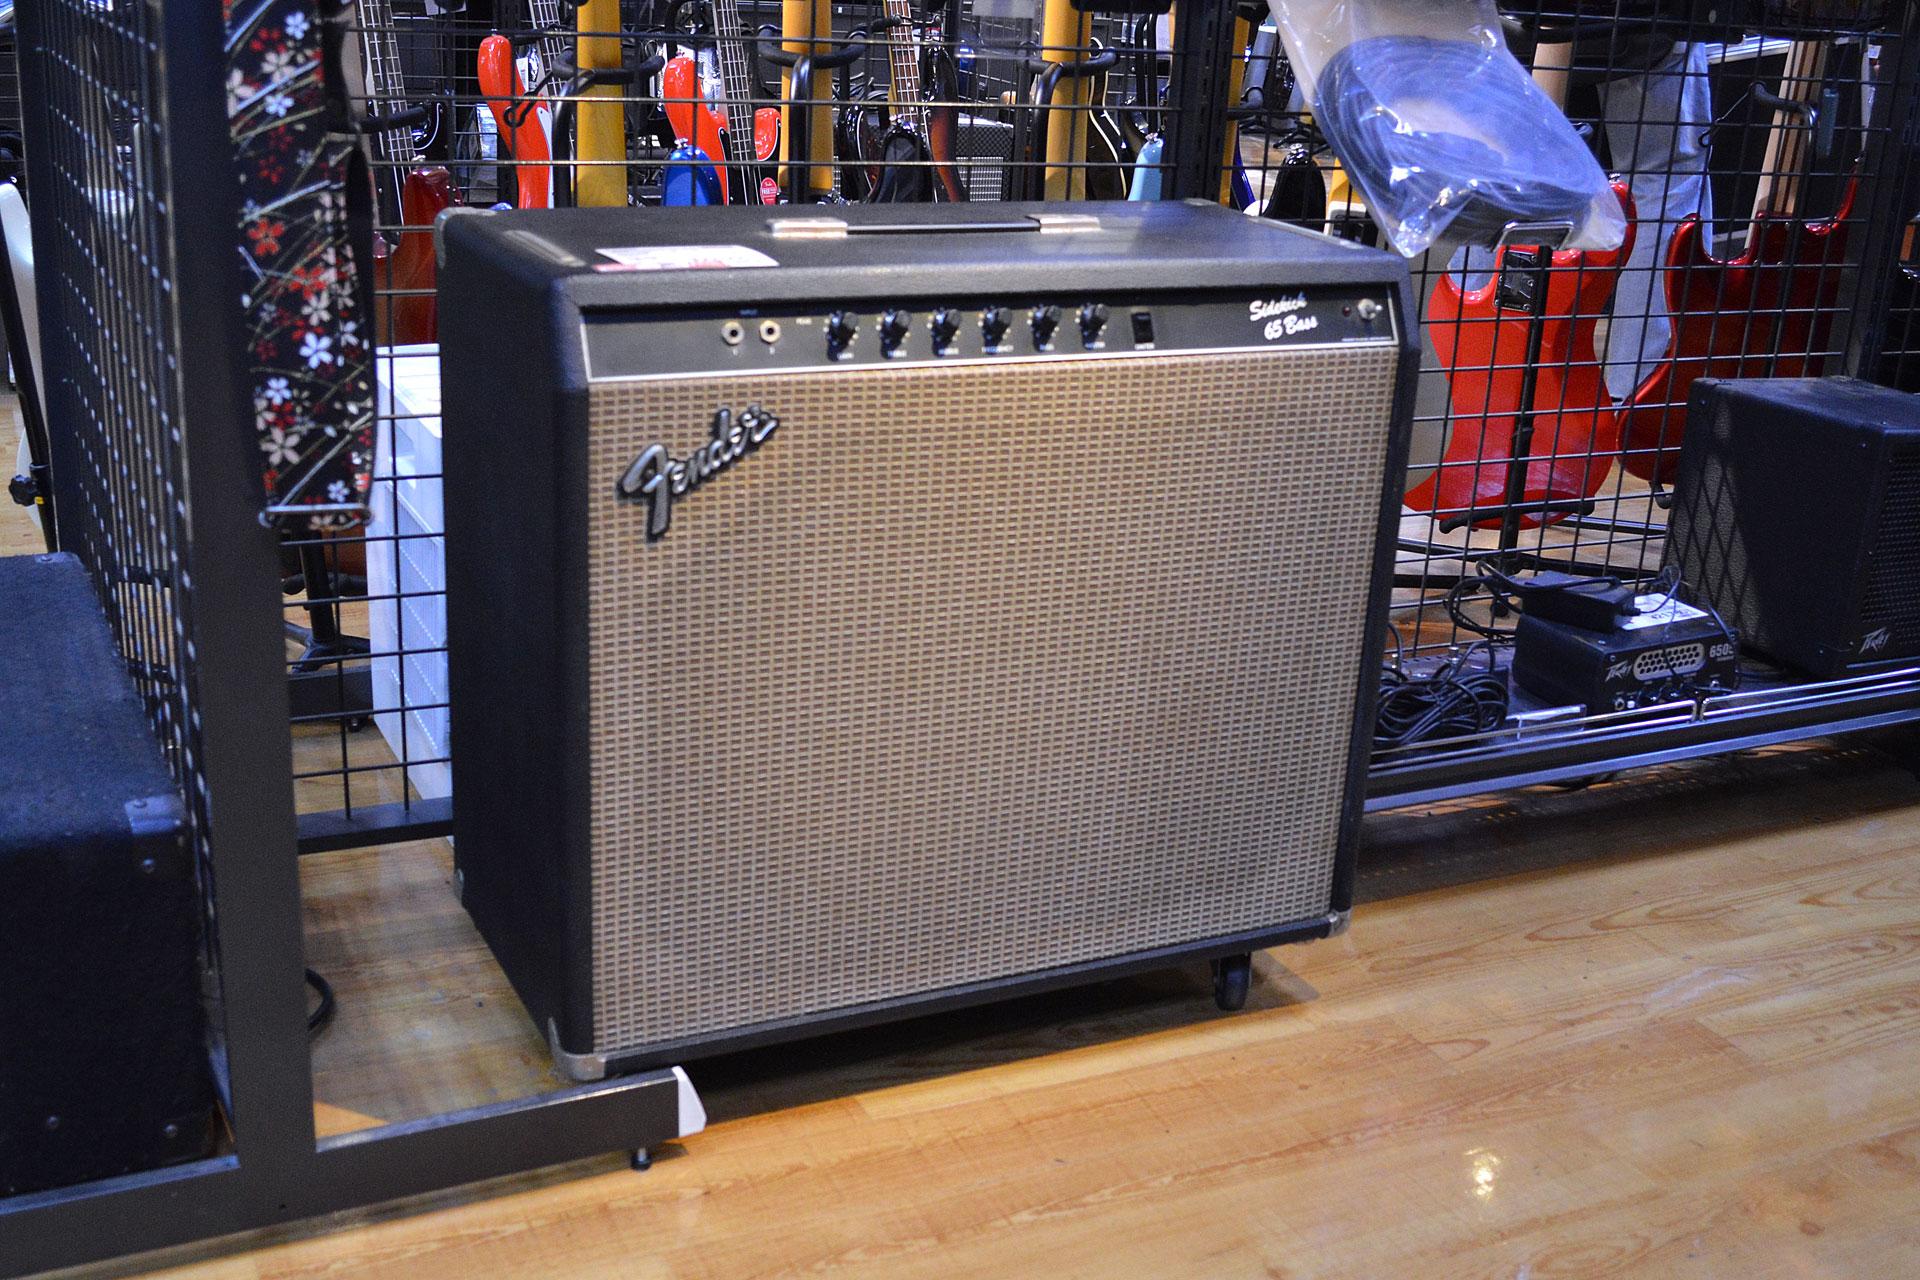 Fender Sidekick 65 Bassアンプ店頭画像